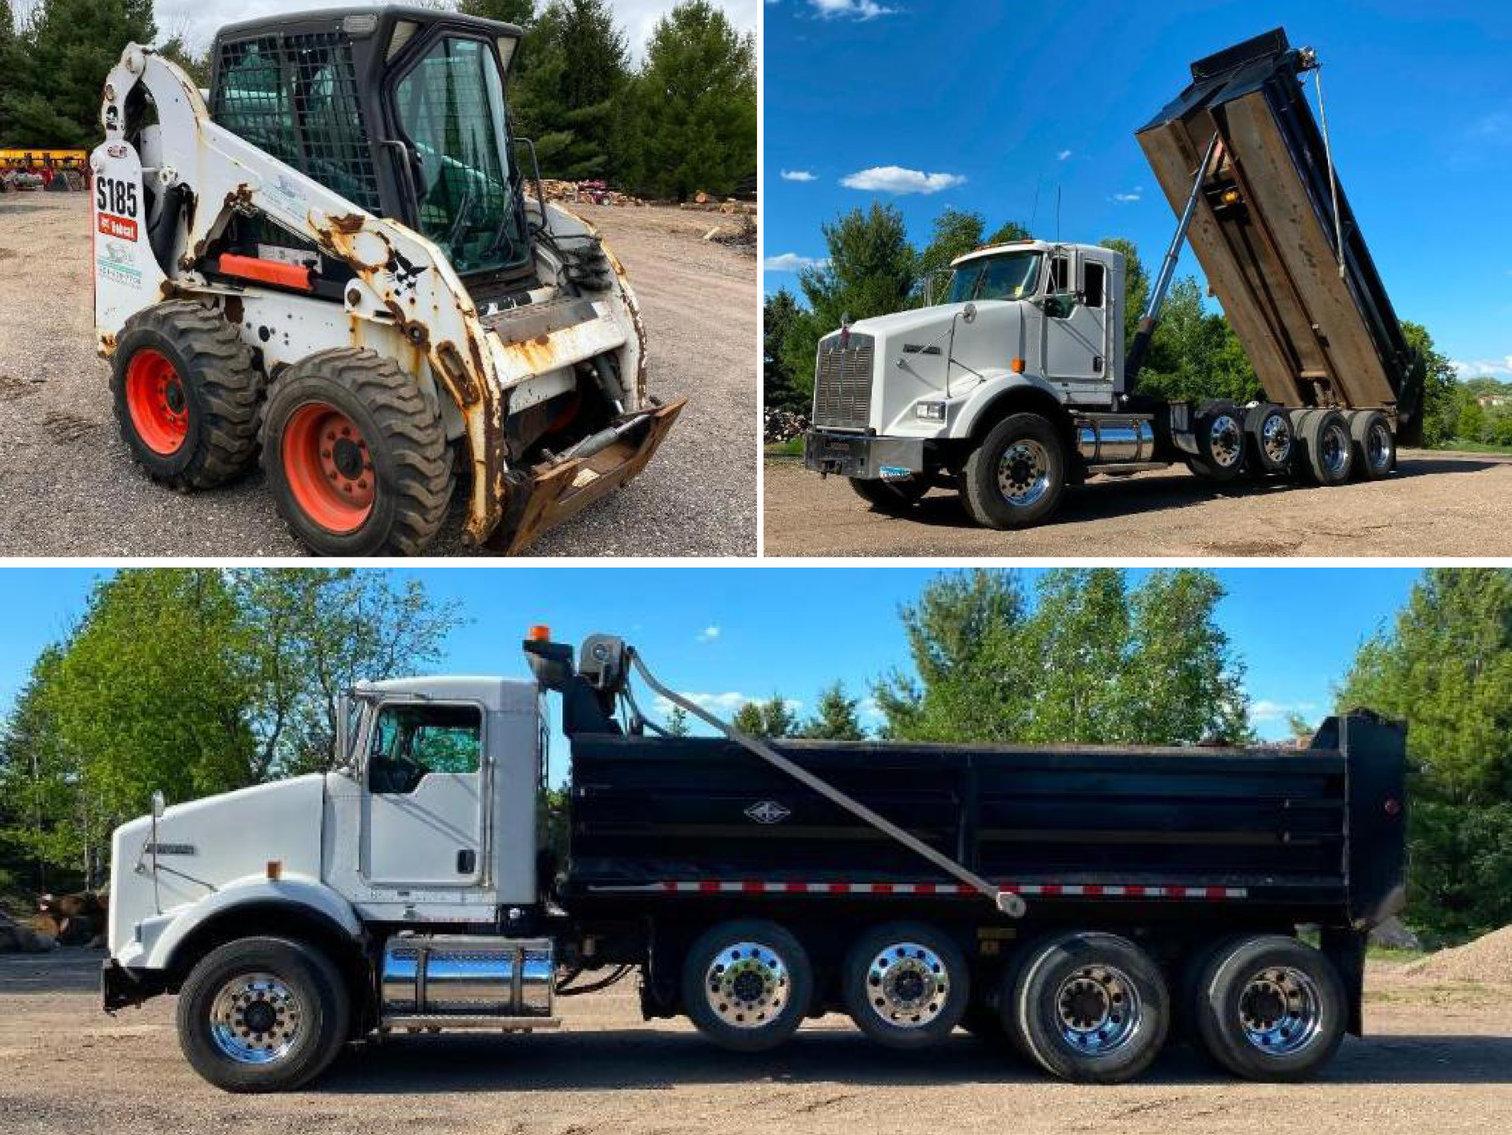 2012 Kenworth T800 Quad Axle Dump Truck, 2013 Bobcat S185 Skid Loader